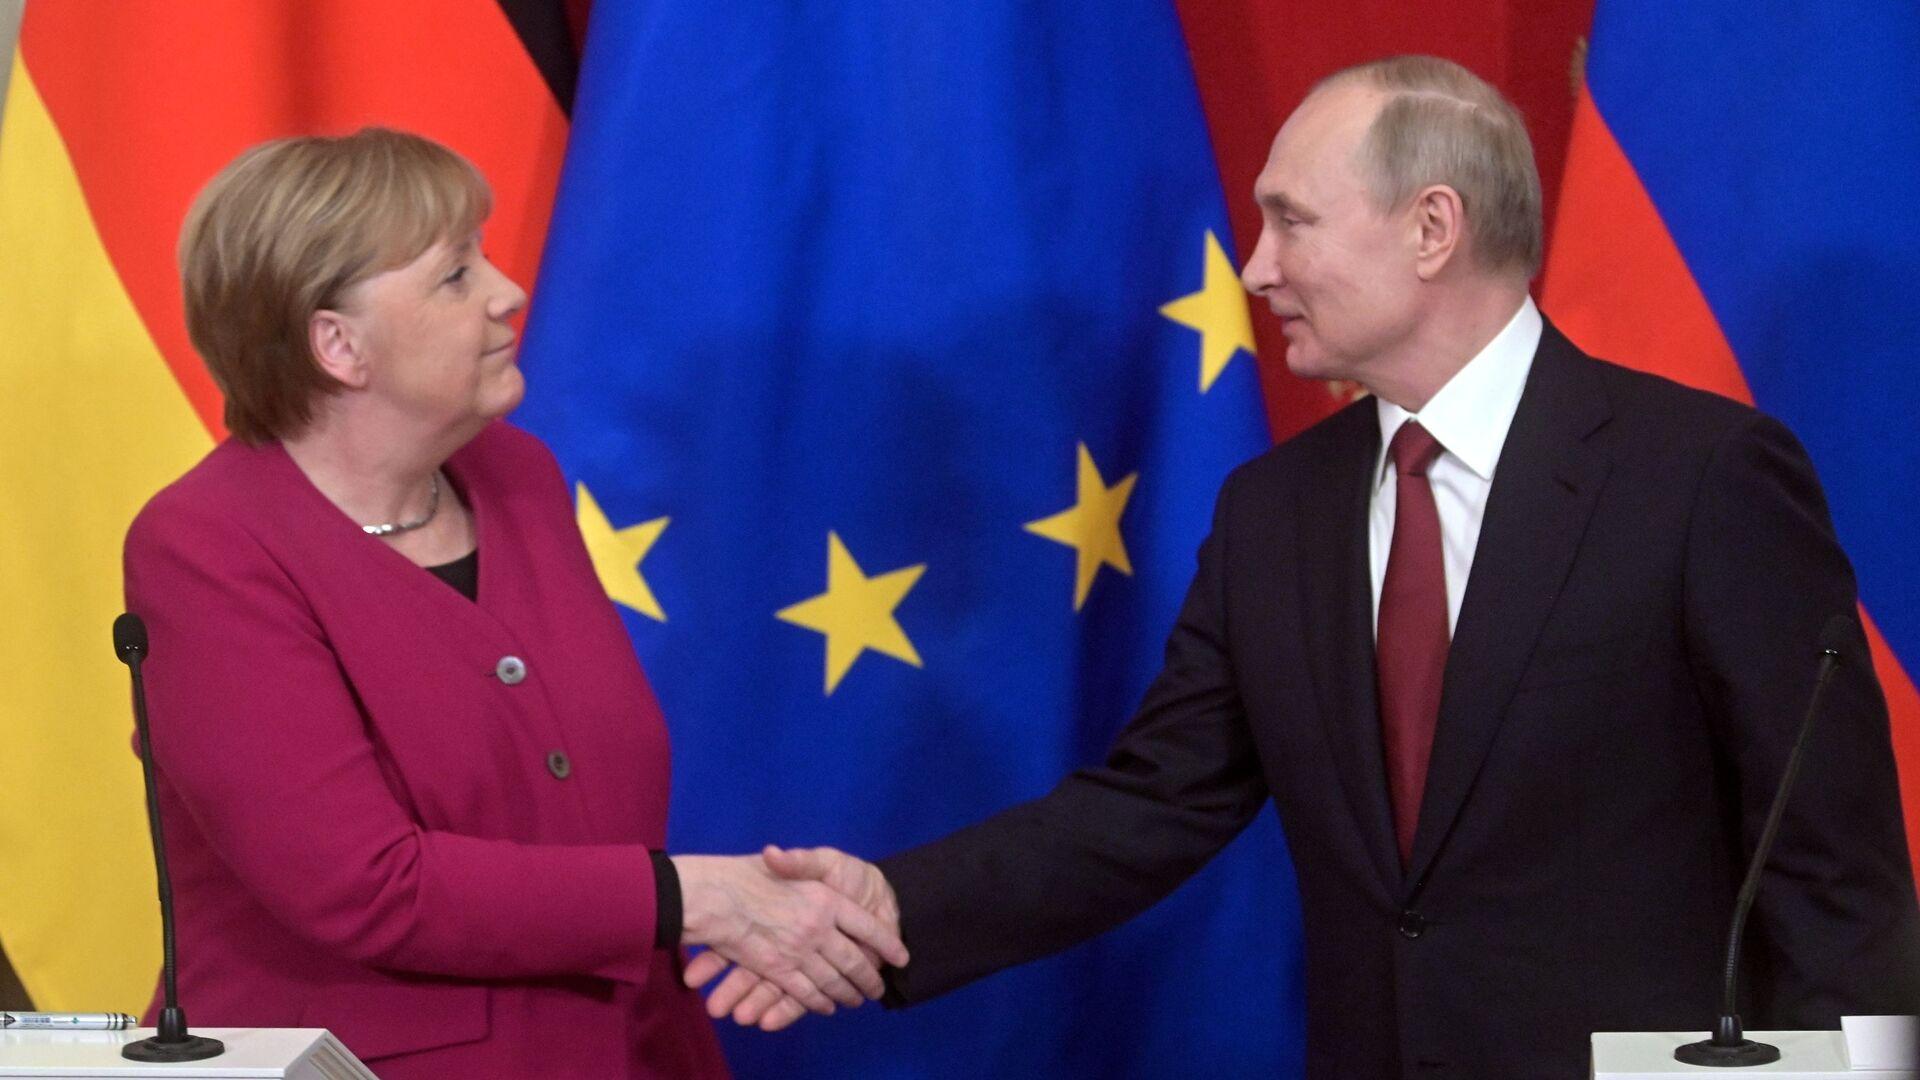 La canciller alemana, Angela Merkel, estrecha la mano del presidente ruso, Vladímir Putin - Sputnik Mundo, 1920, 29.09.2021